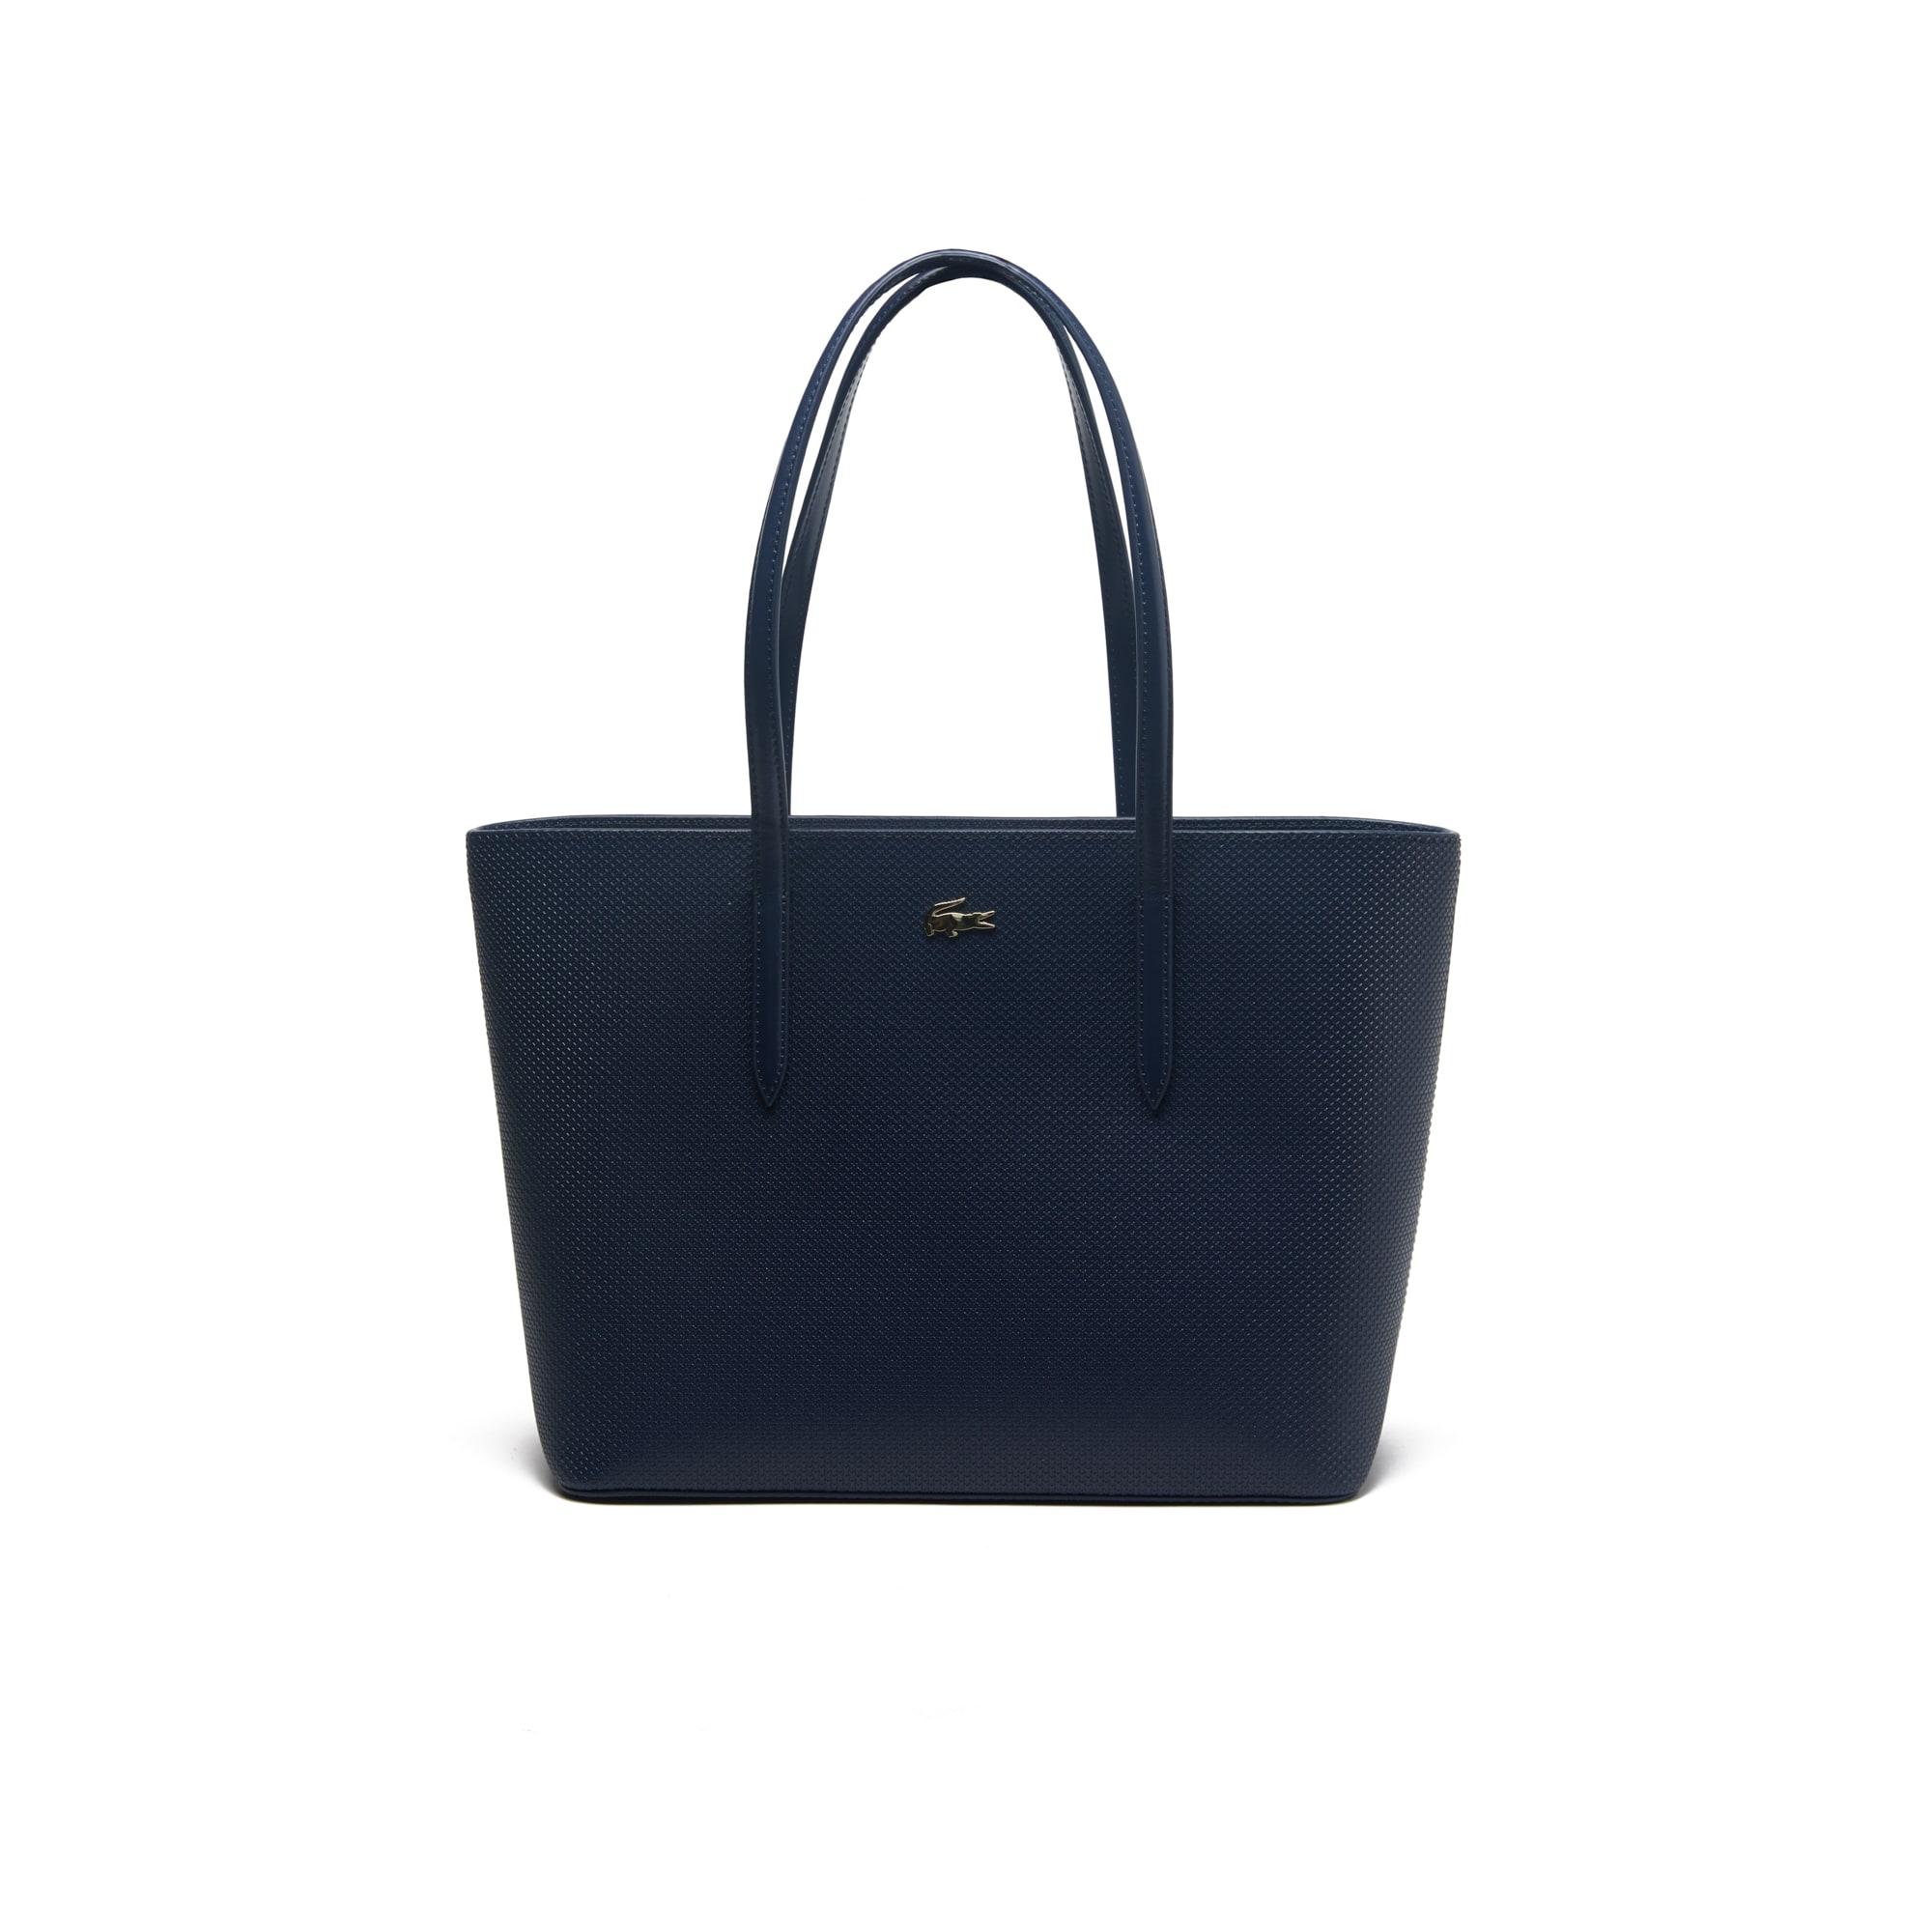 Women's Chantaco Piqué Leather Zip Tote Bag